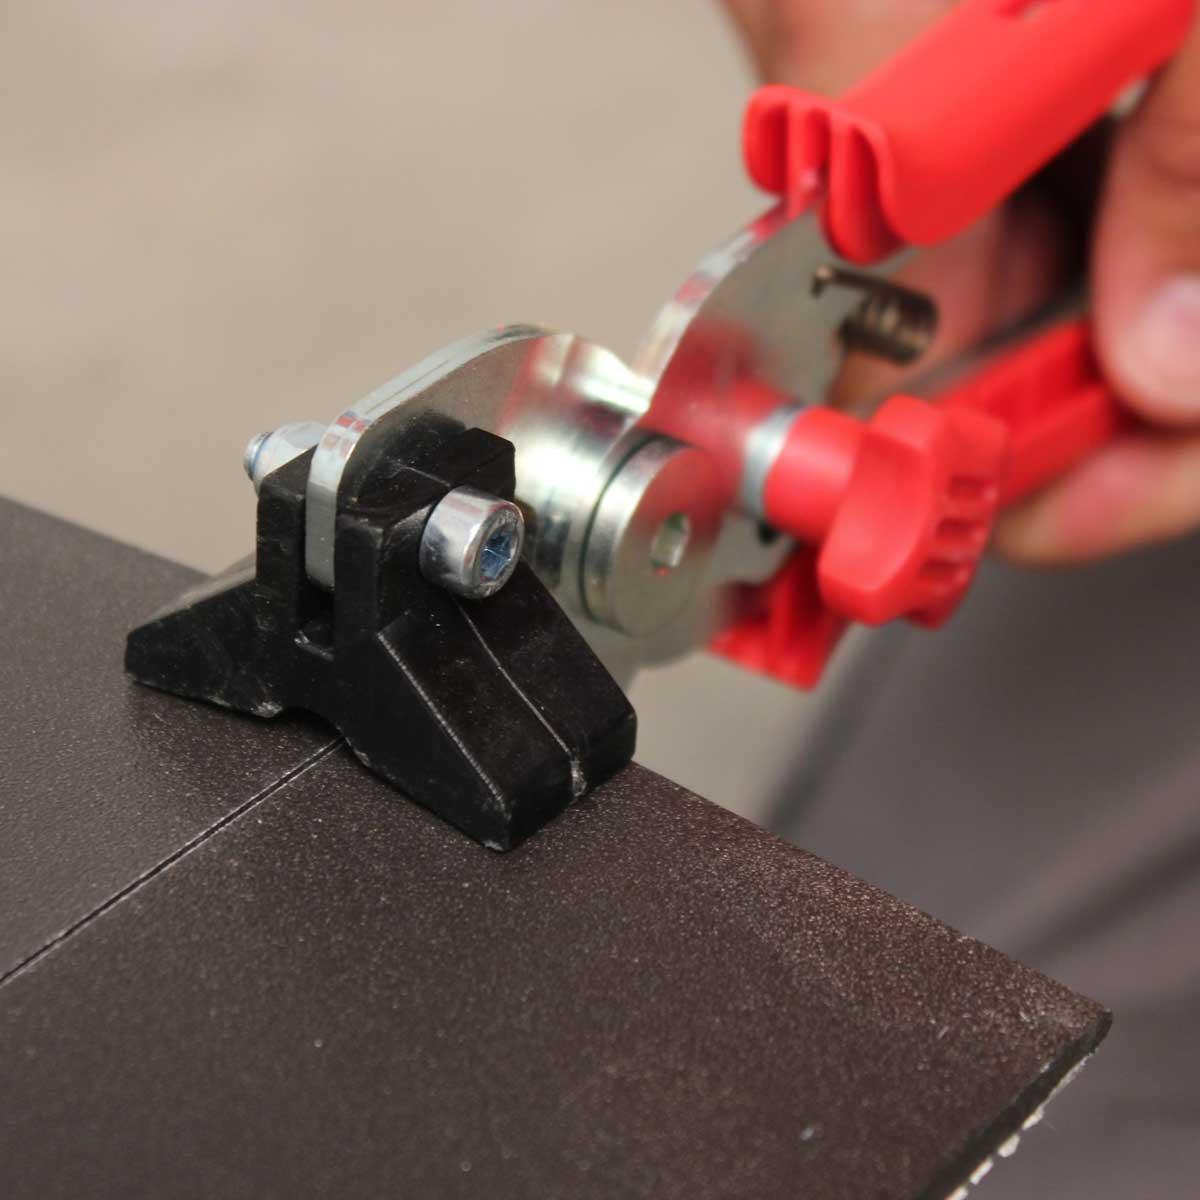 18911 Rubi Slim Cutter Pliers